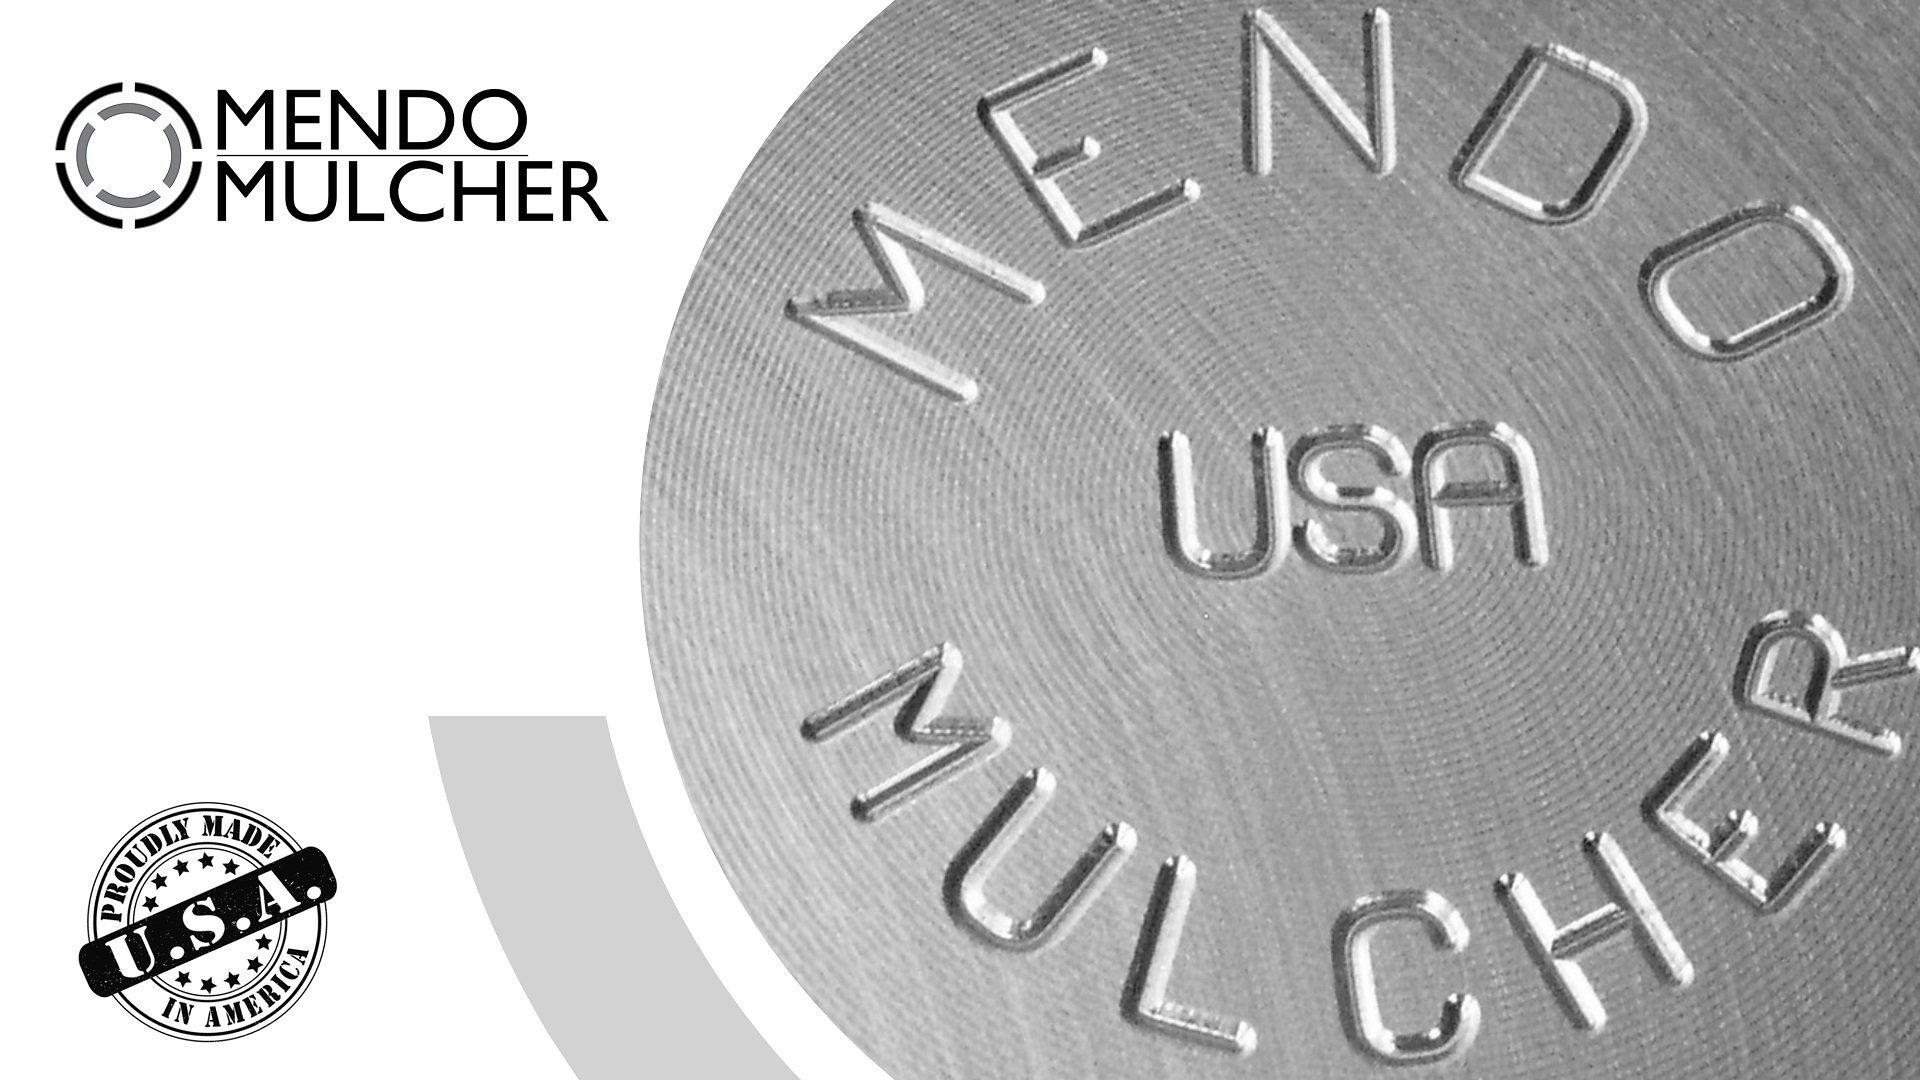 Mendo Mulcher Home Page Banner Image